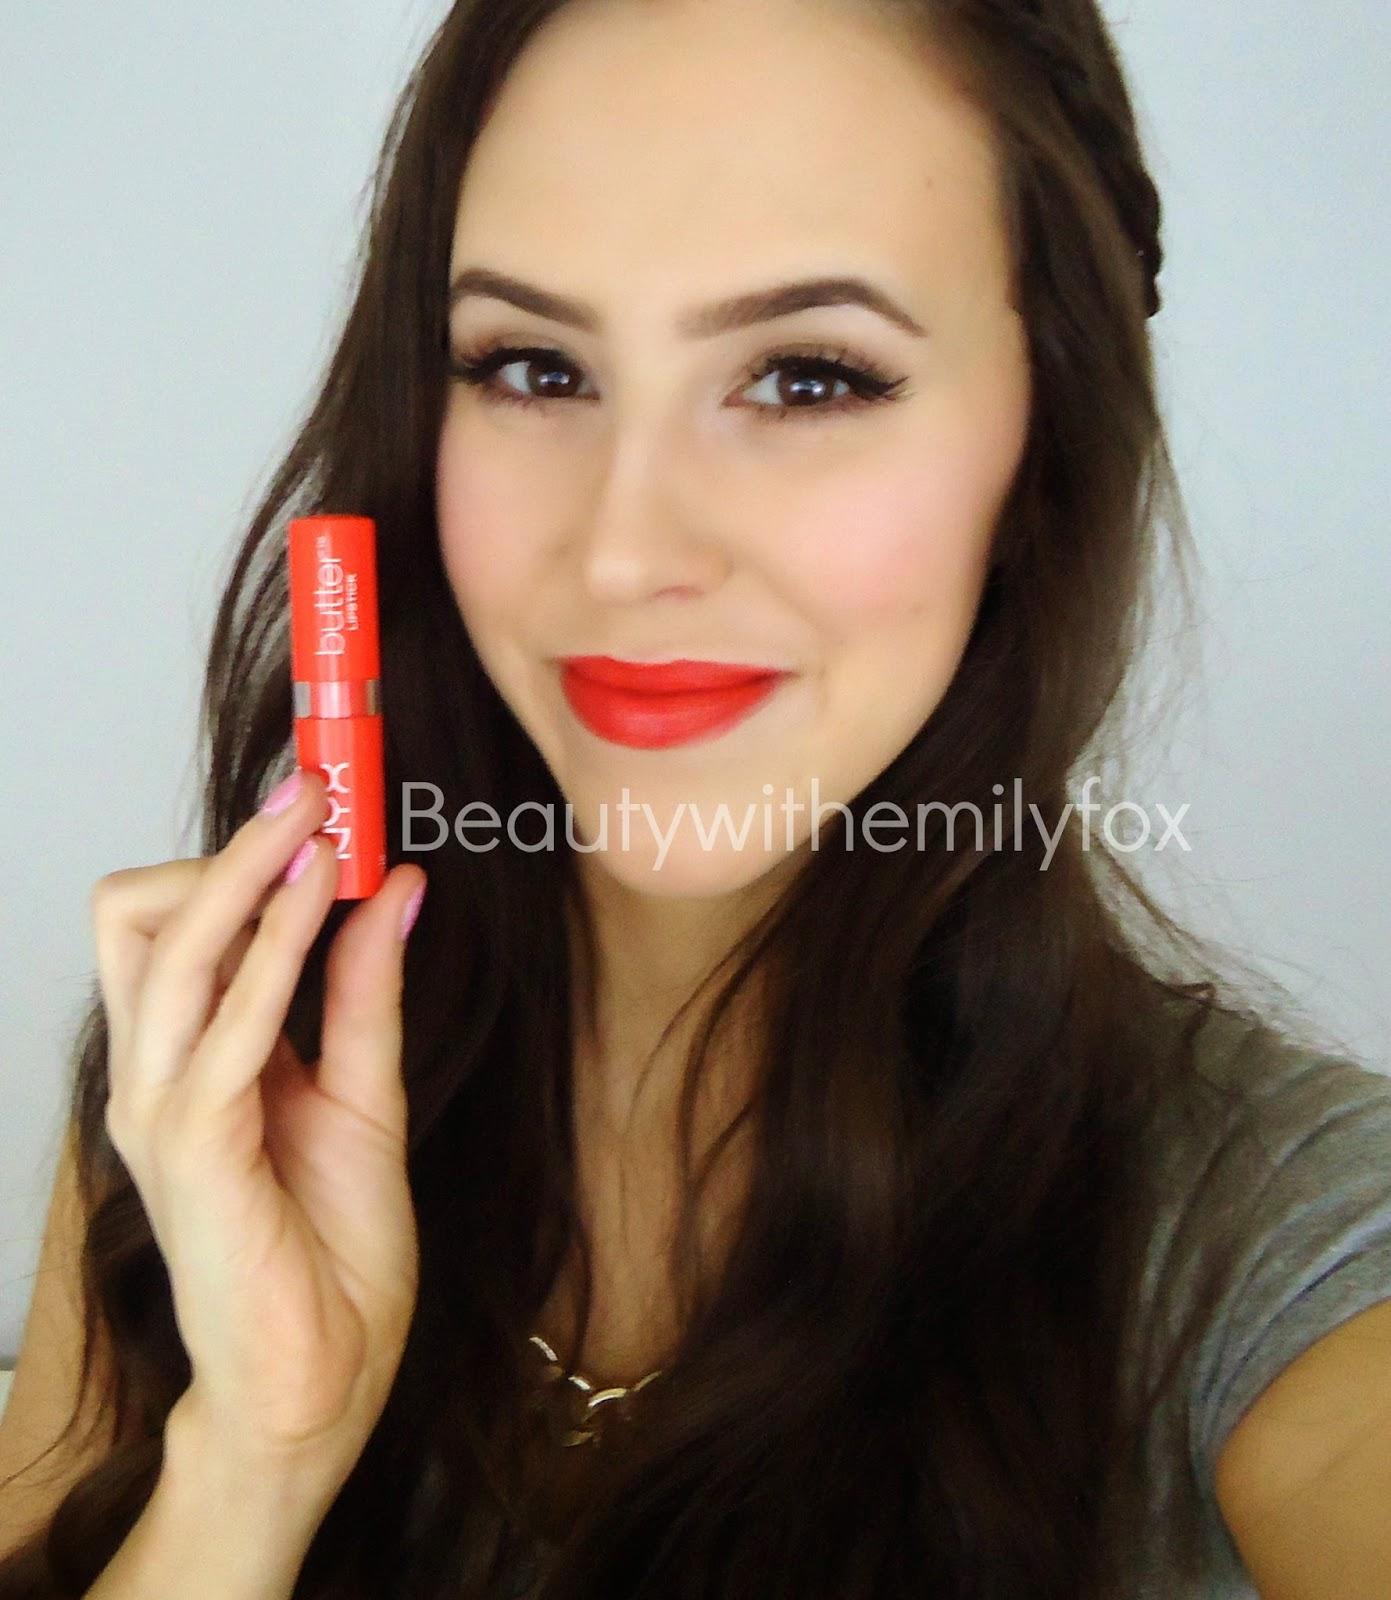 c31f01d41c3 Beautywithemilyfox  NYX Butter Lipsticks Collection